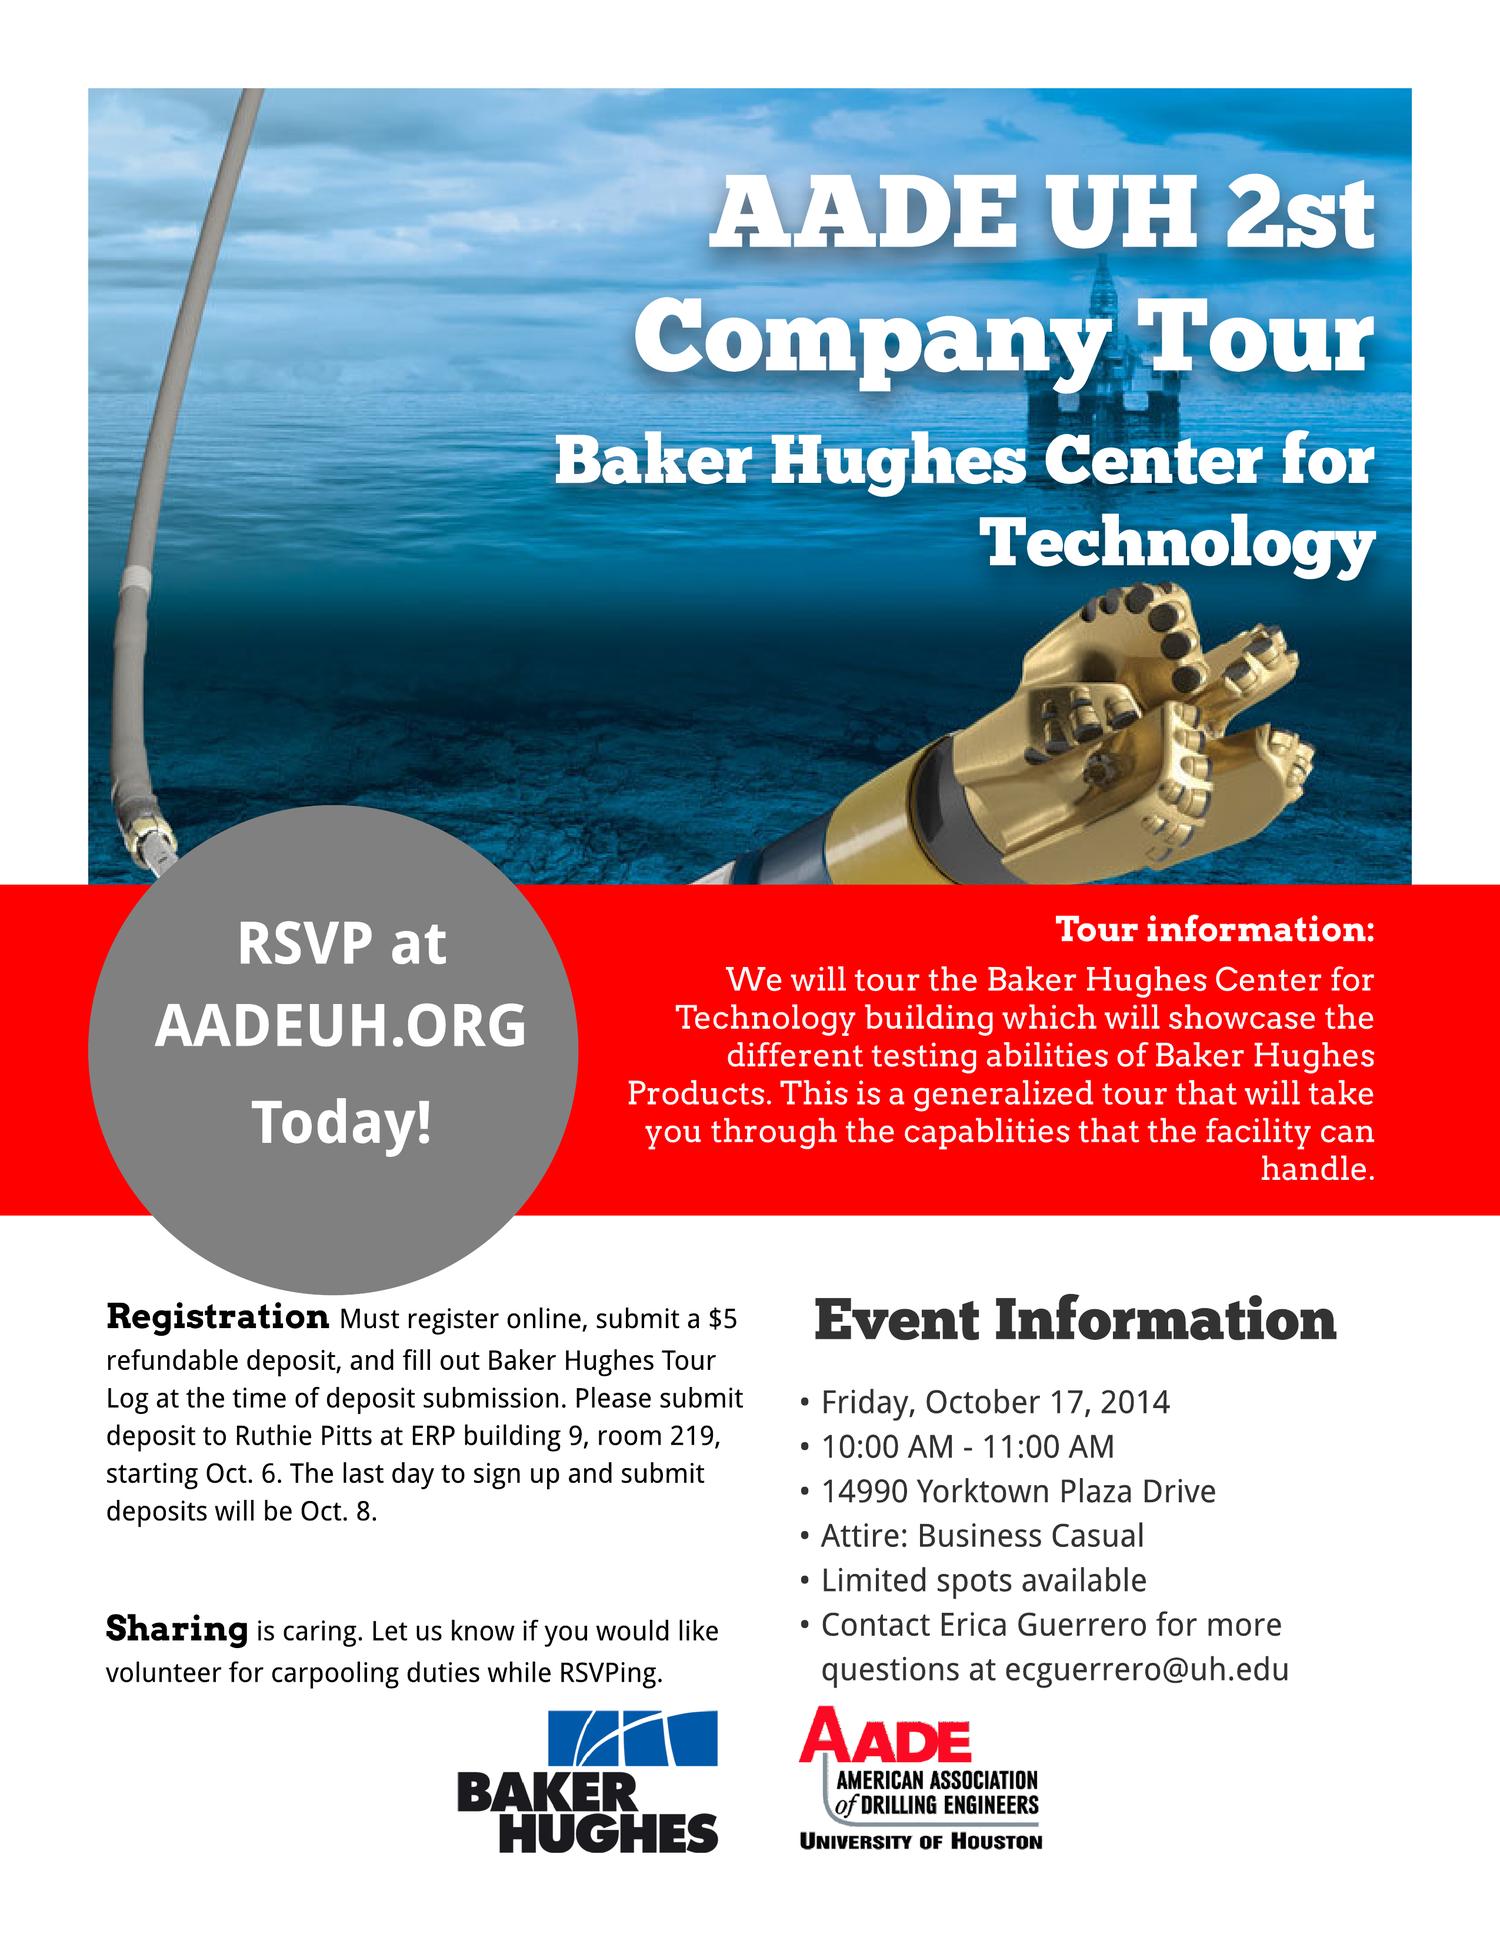 2nd Facility Tour - Baker Hughes Tour, RSVP Oct  6-8 — AADE